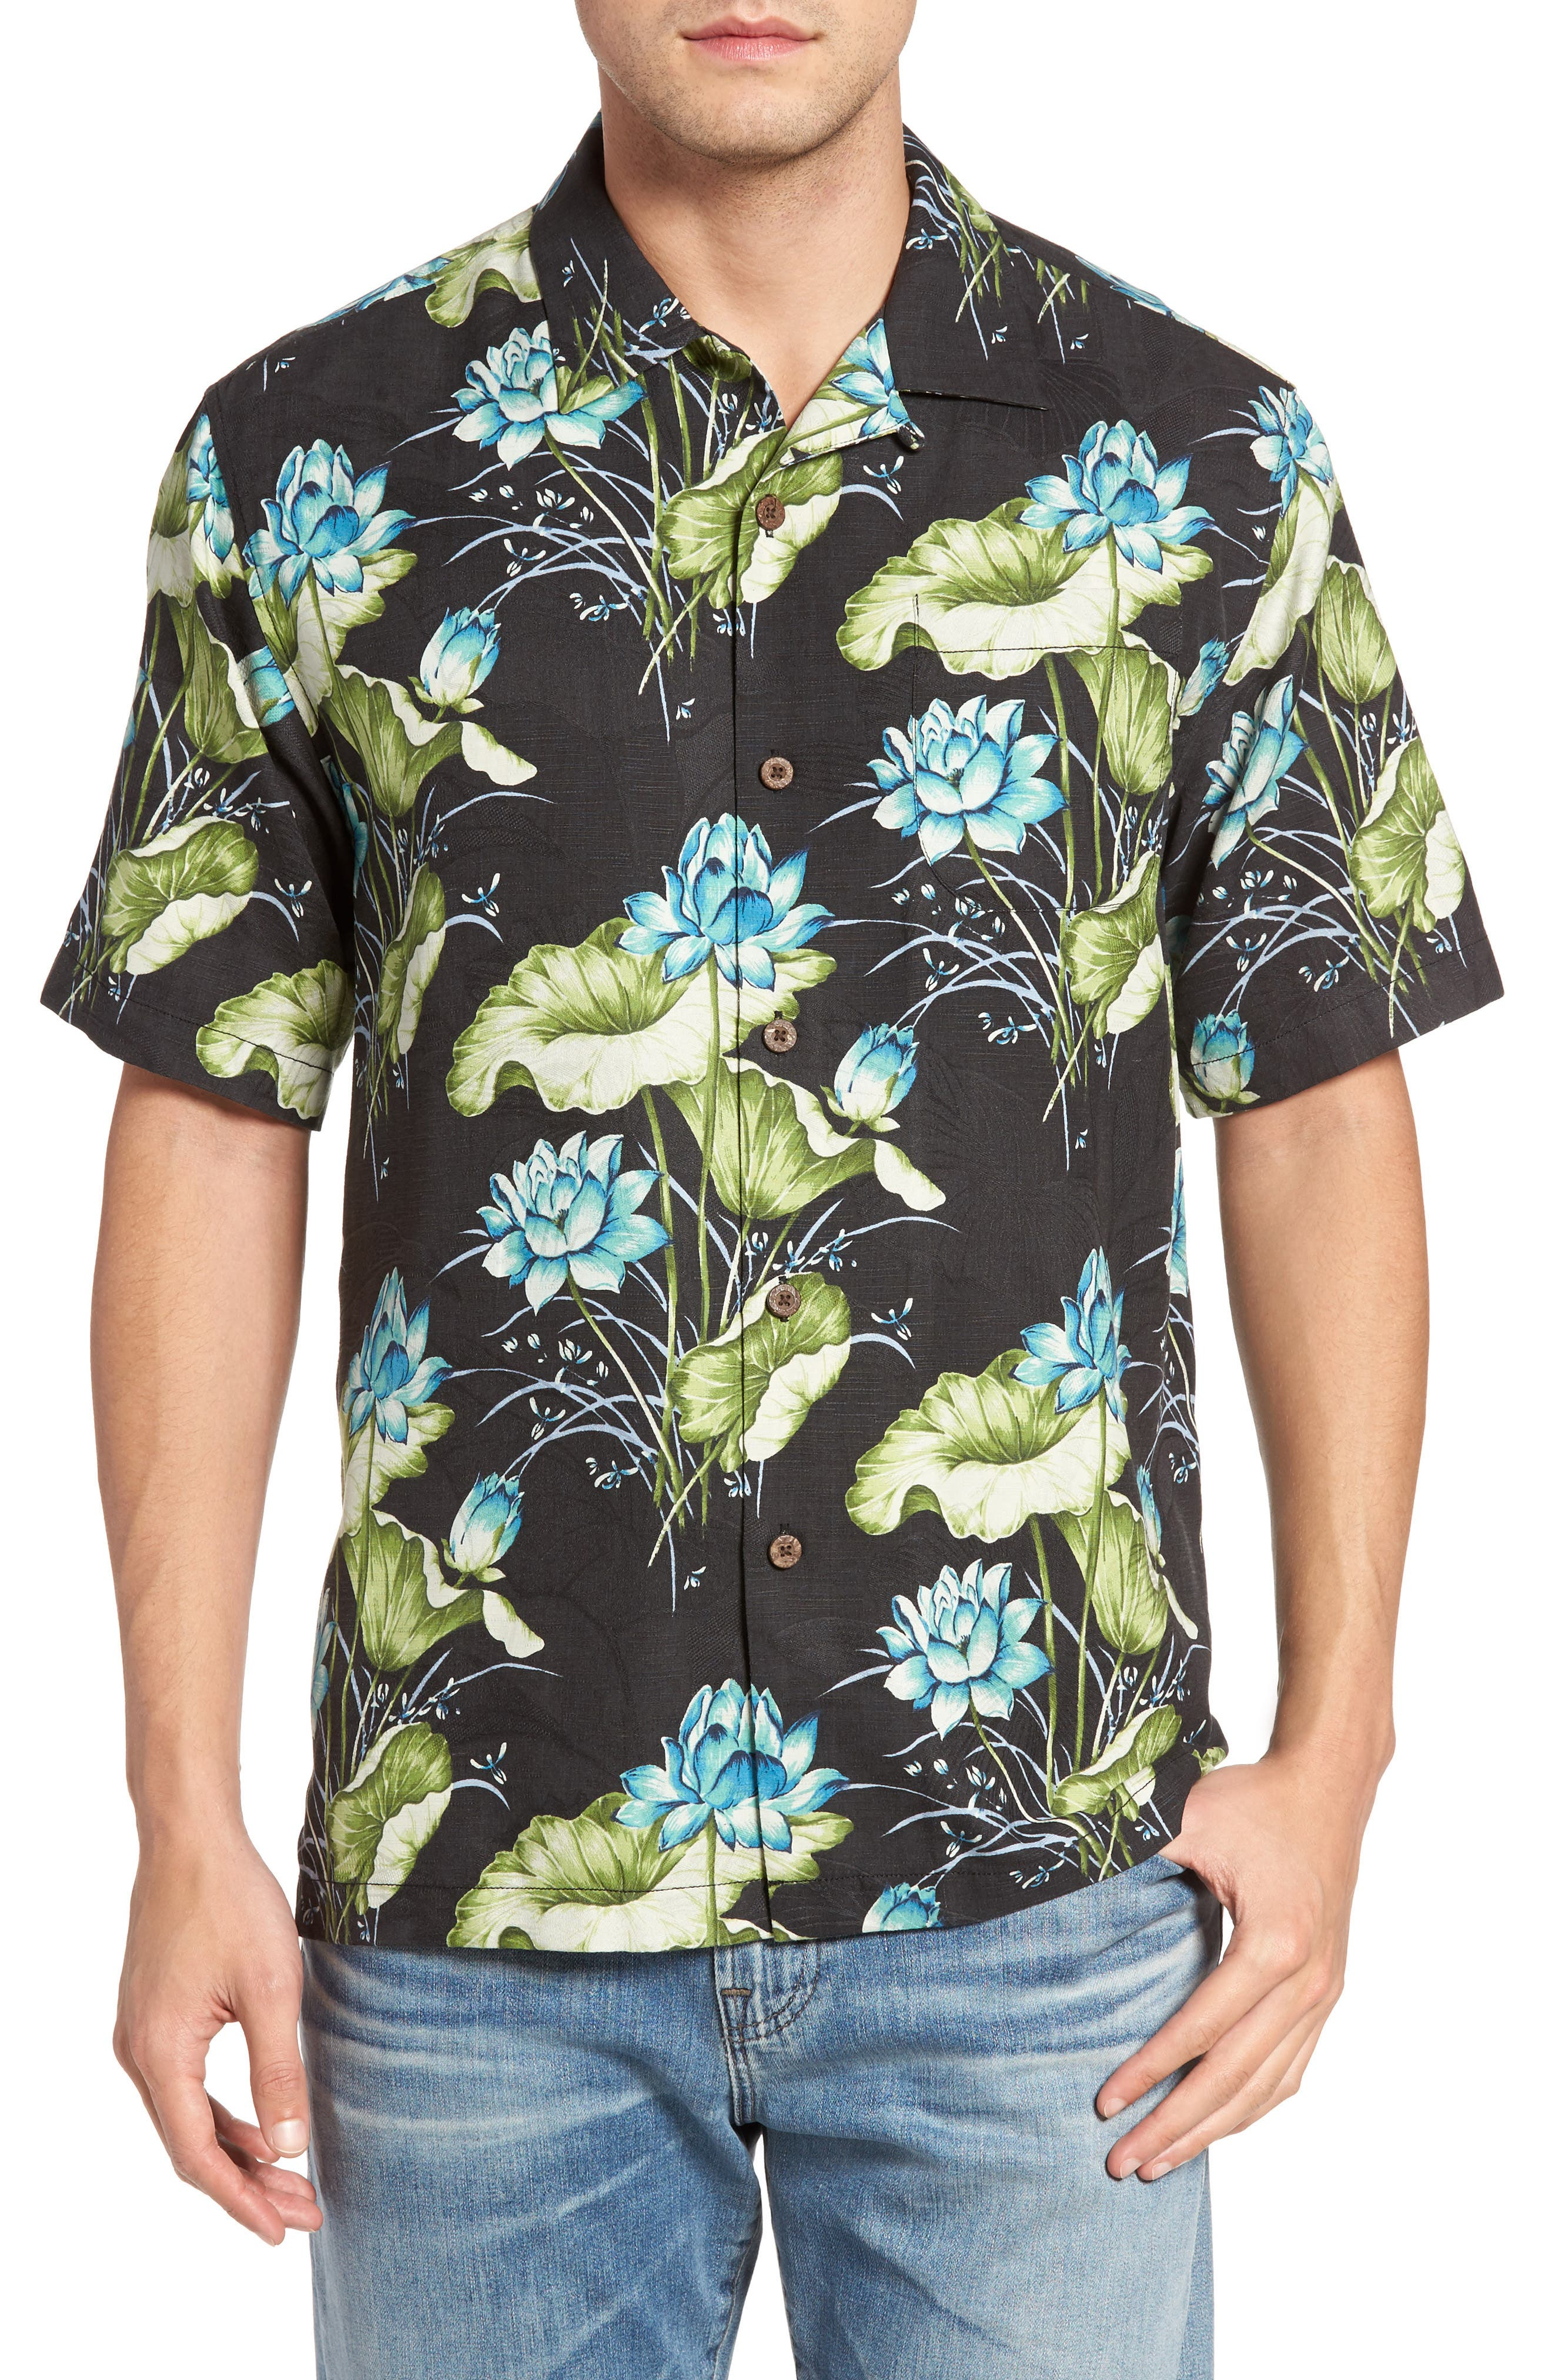 Alternate Image 1 Selected - Tommy Bahama Adriatic Garden Silk Blend Camp Shirt